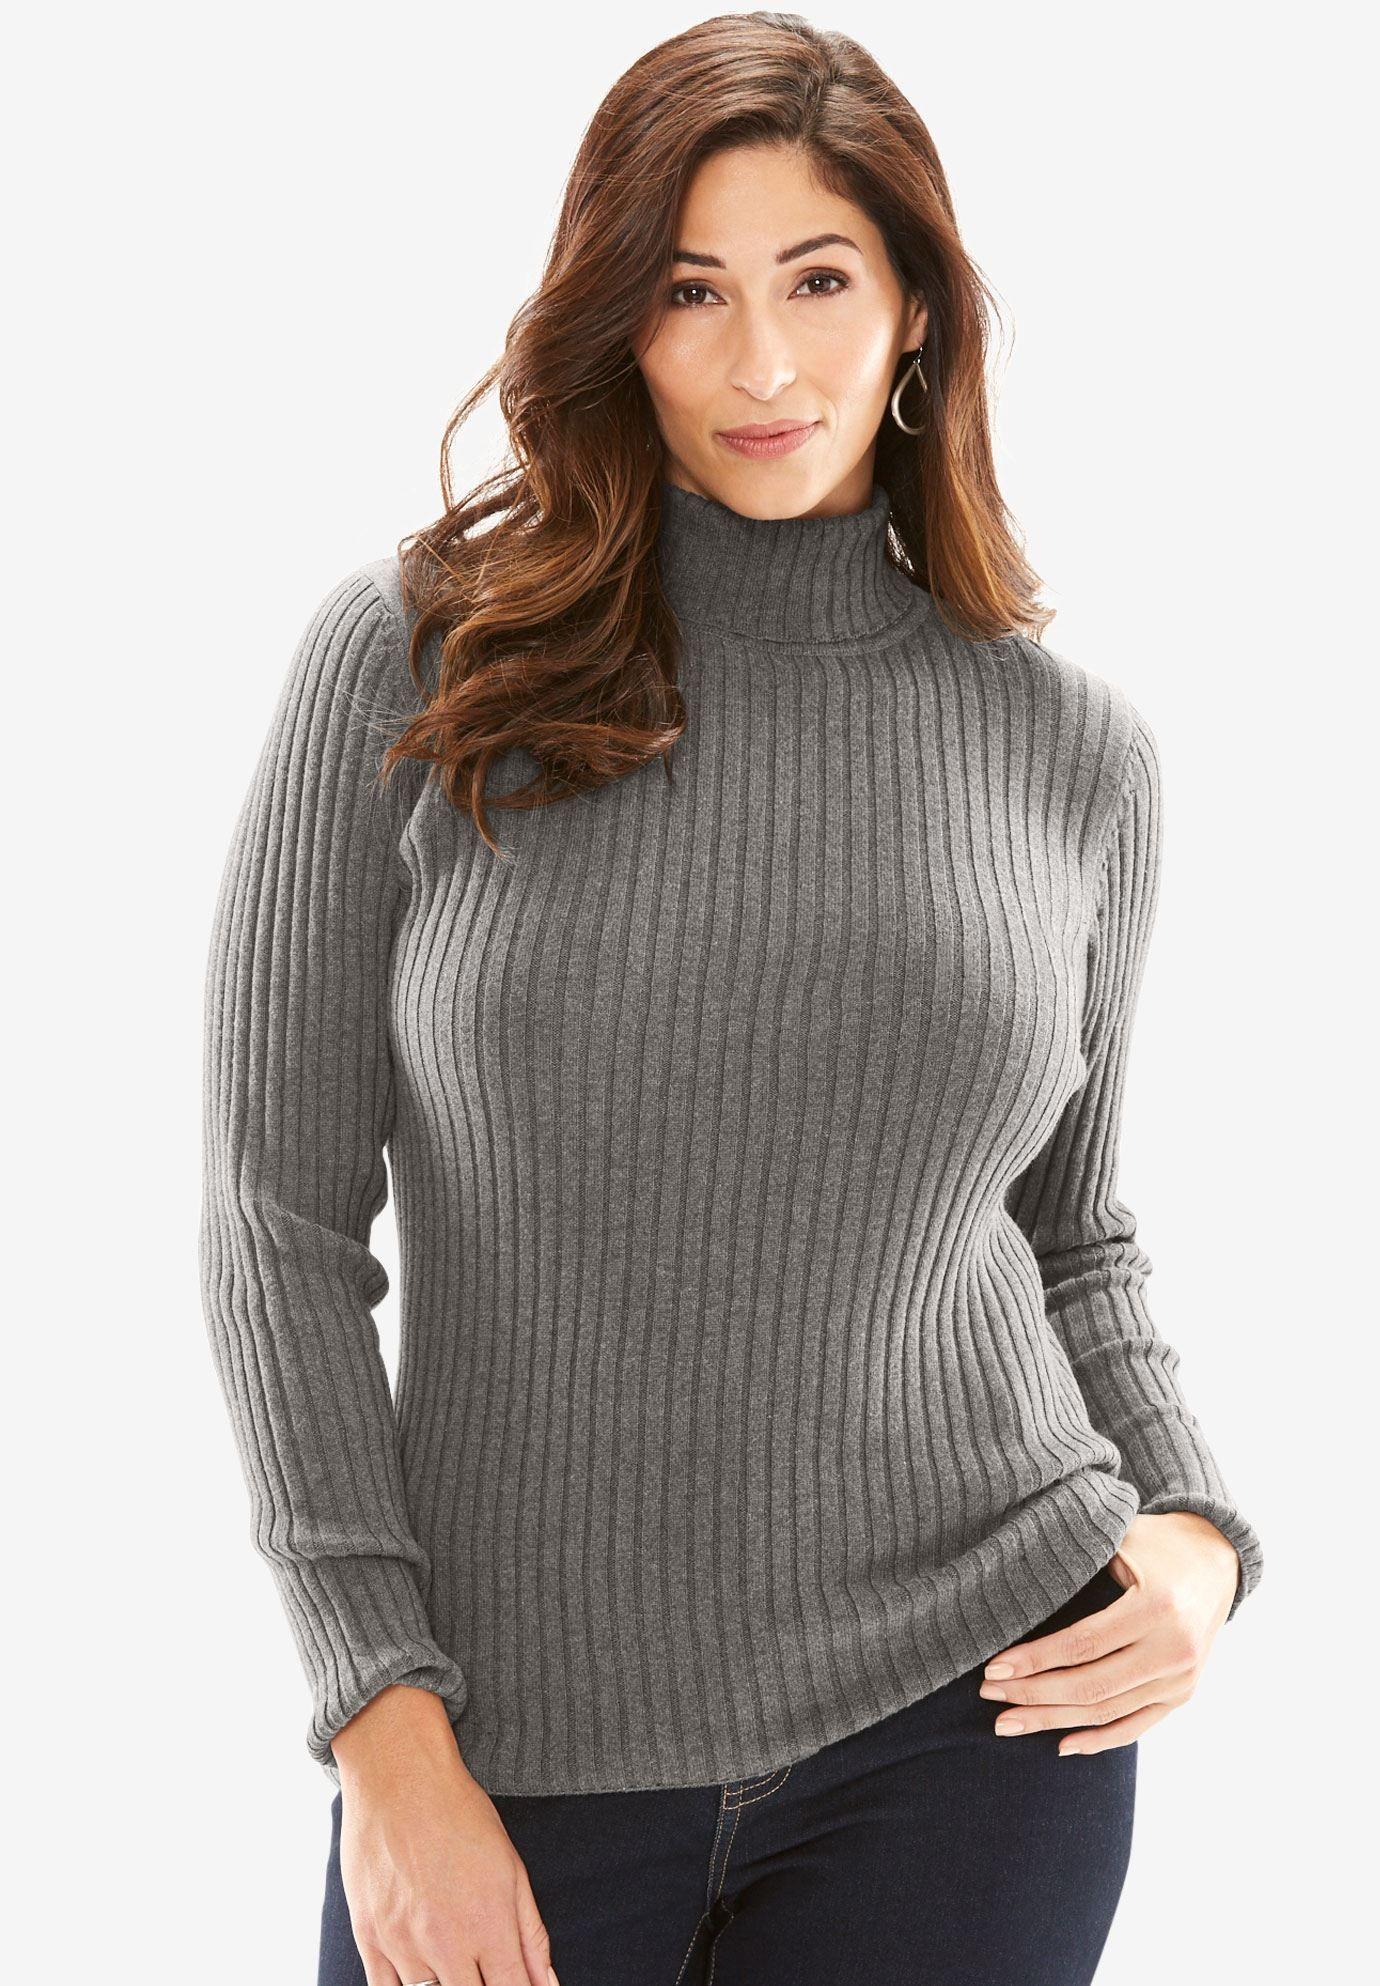 b530af9abe Turtleneck Sweater with Ribbing - Women s Plus Size Clothing ...